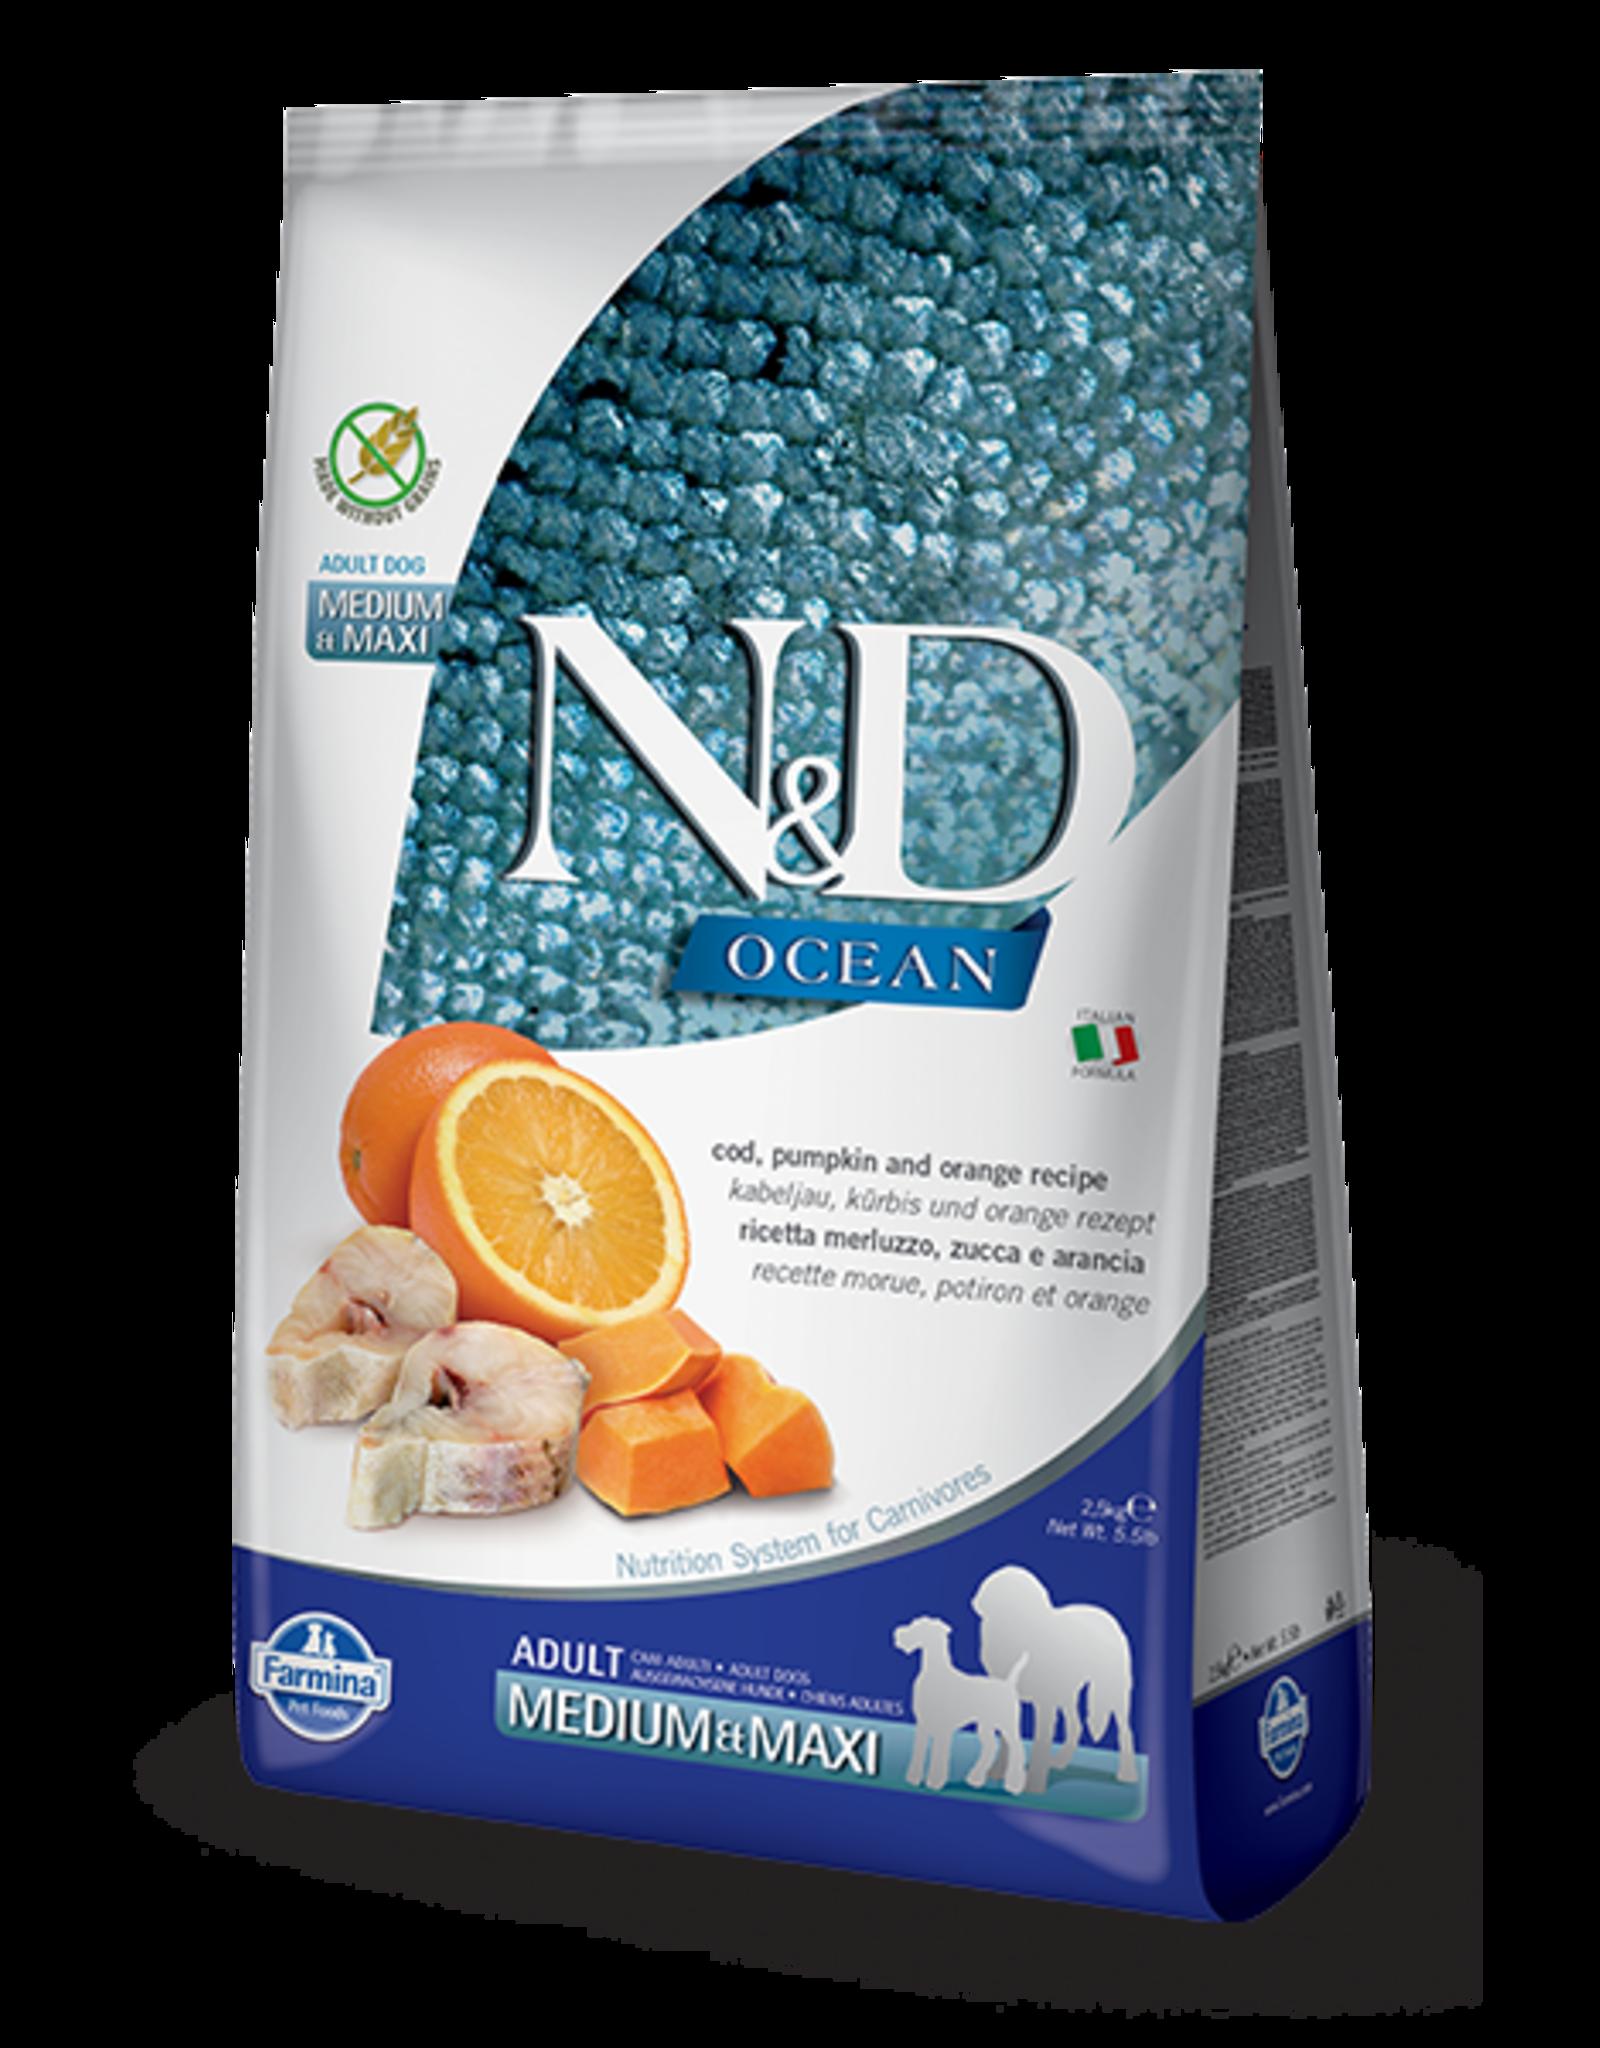 Farmina N&D Farmina N&D Ocean Cod, Pumpkin & Orange Adult Med/Maxi Dog Food